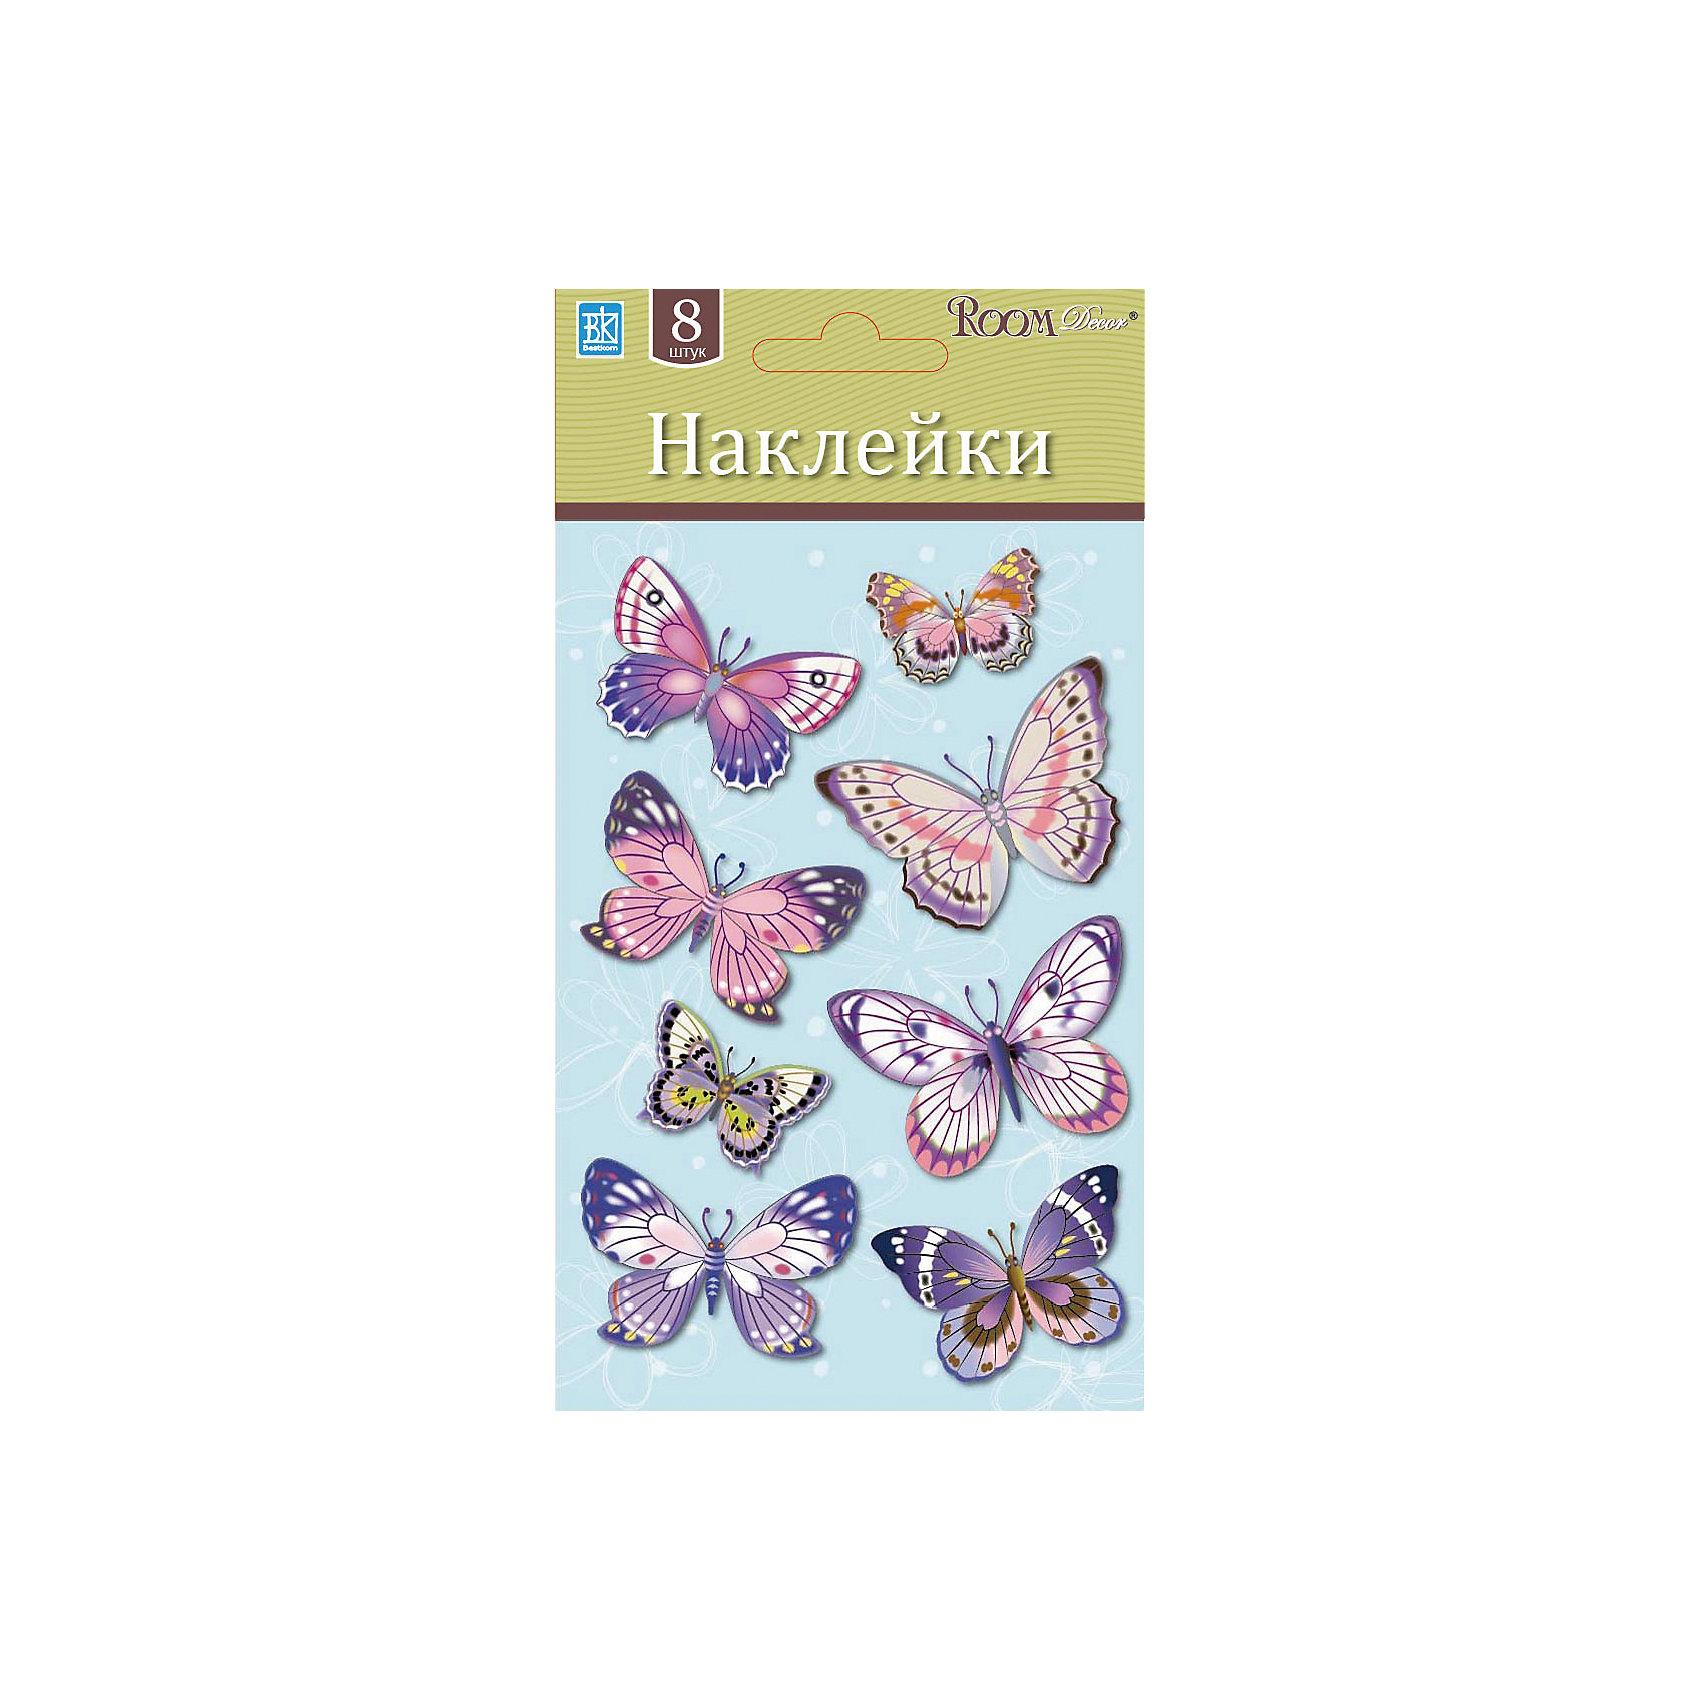 Бабочки мини LCHPA 05008, Room Decor, розовый от myToys